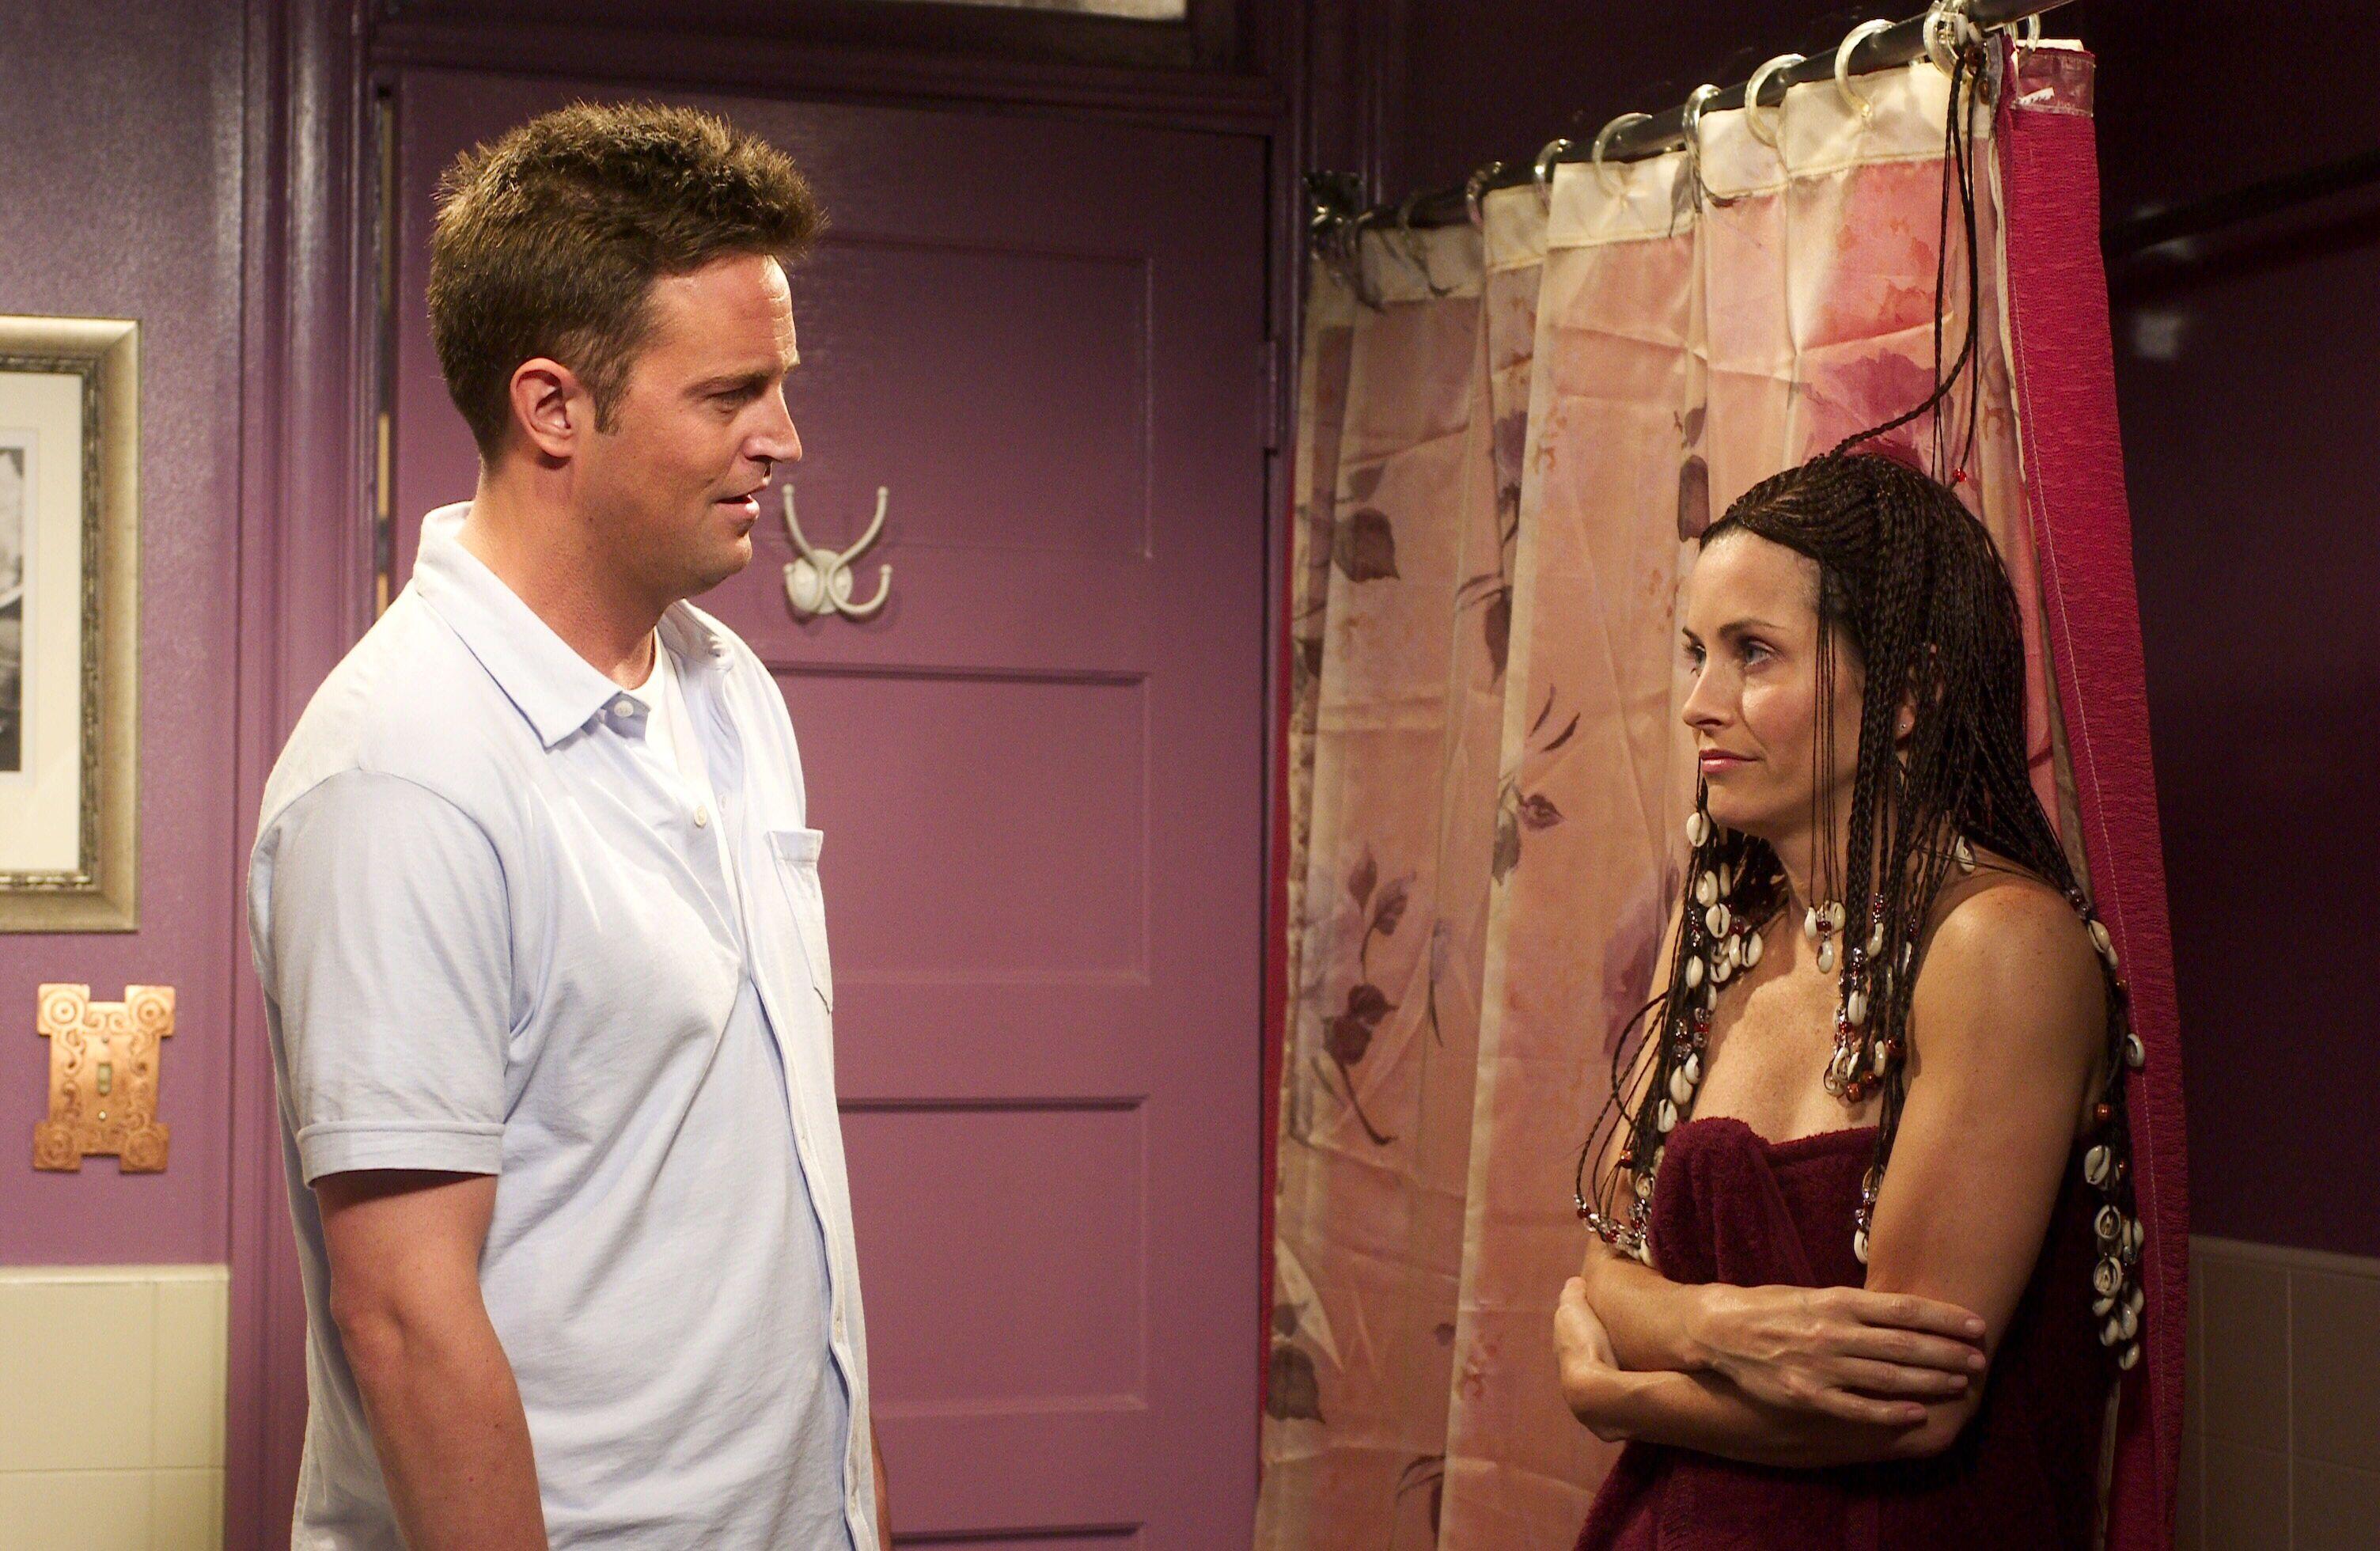 Friends Episode Stills Season 10 Episode 1 The One After Joey